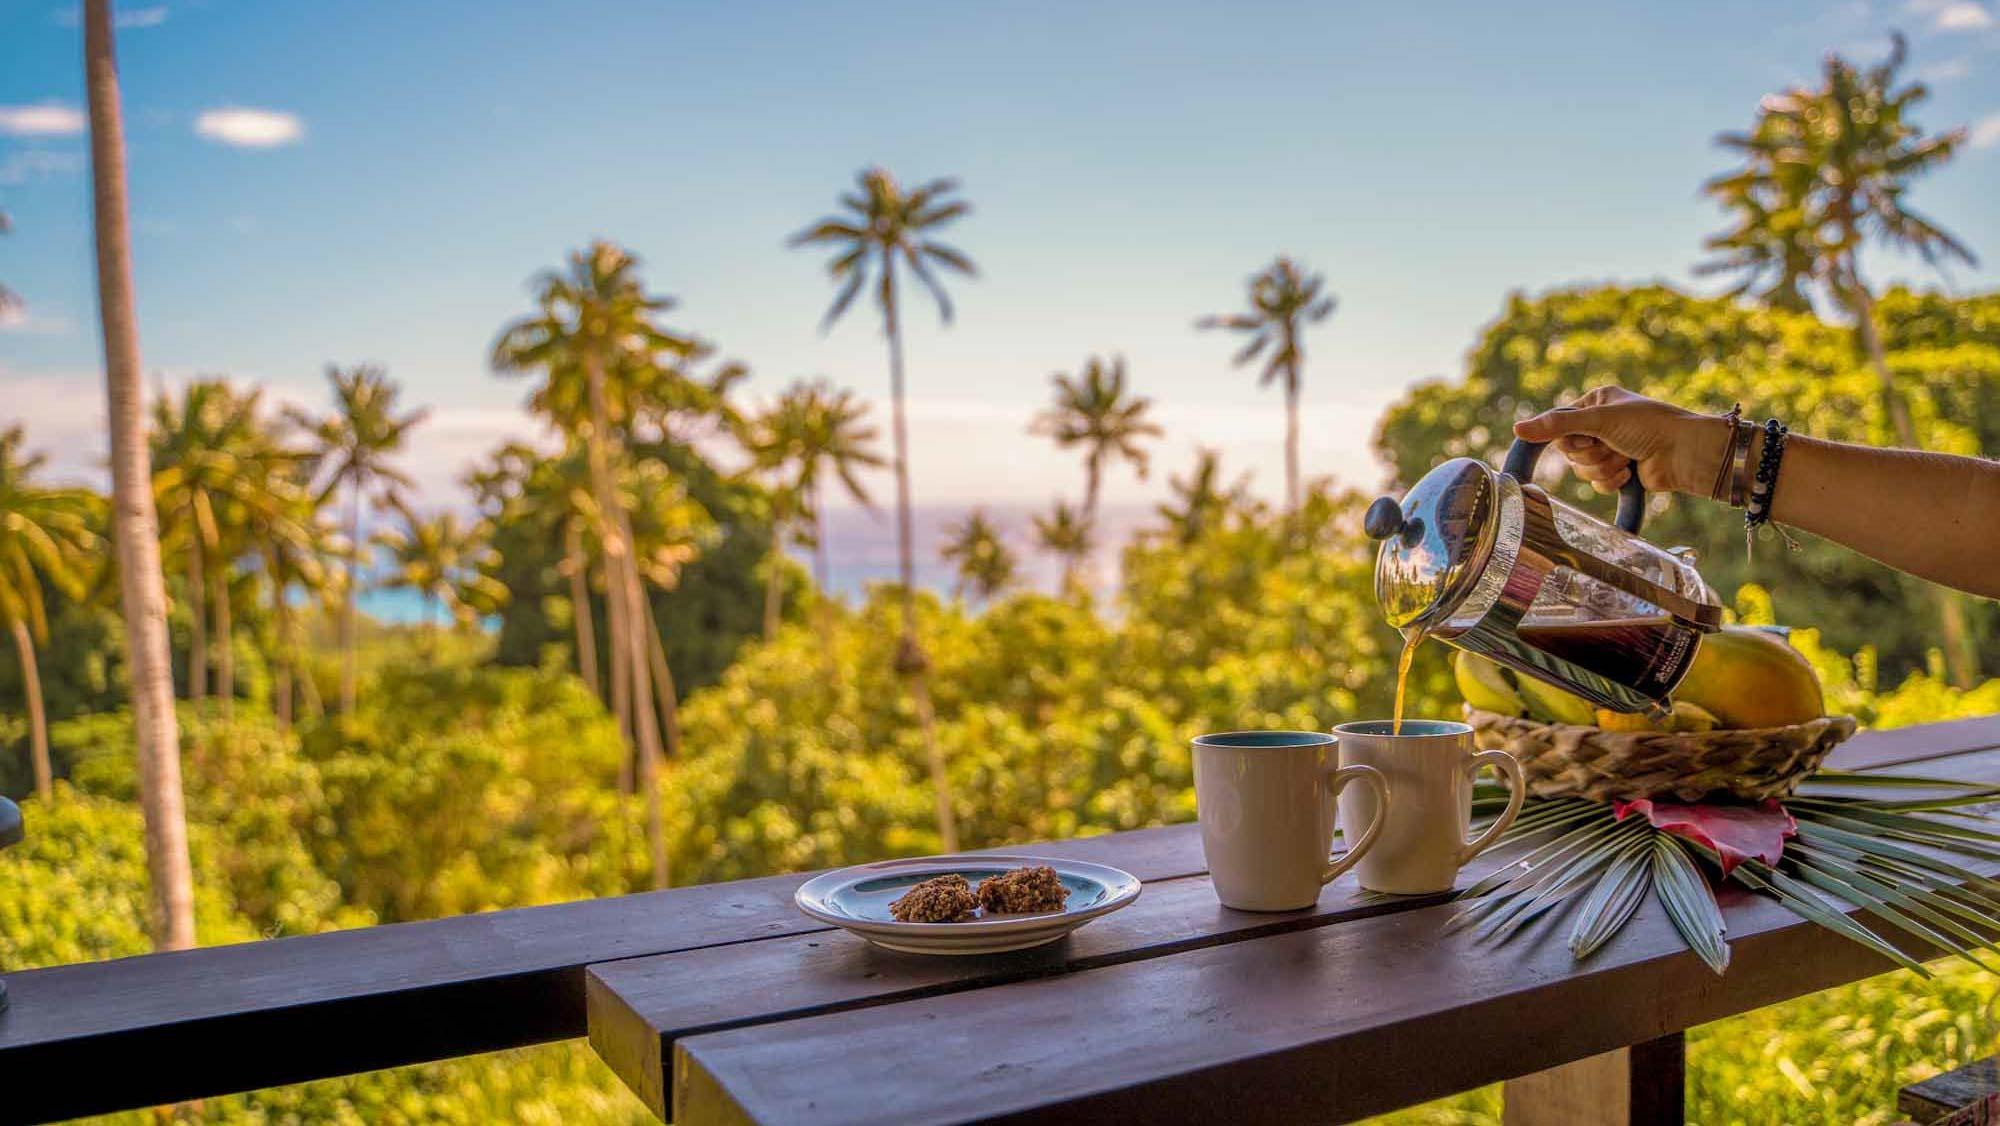 Wake up to coffee on the veranda